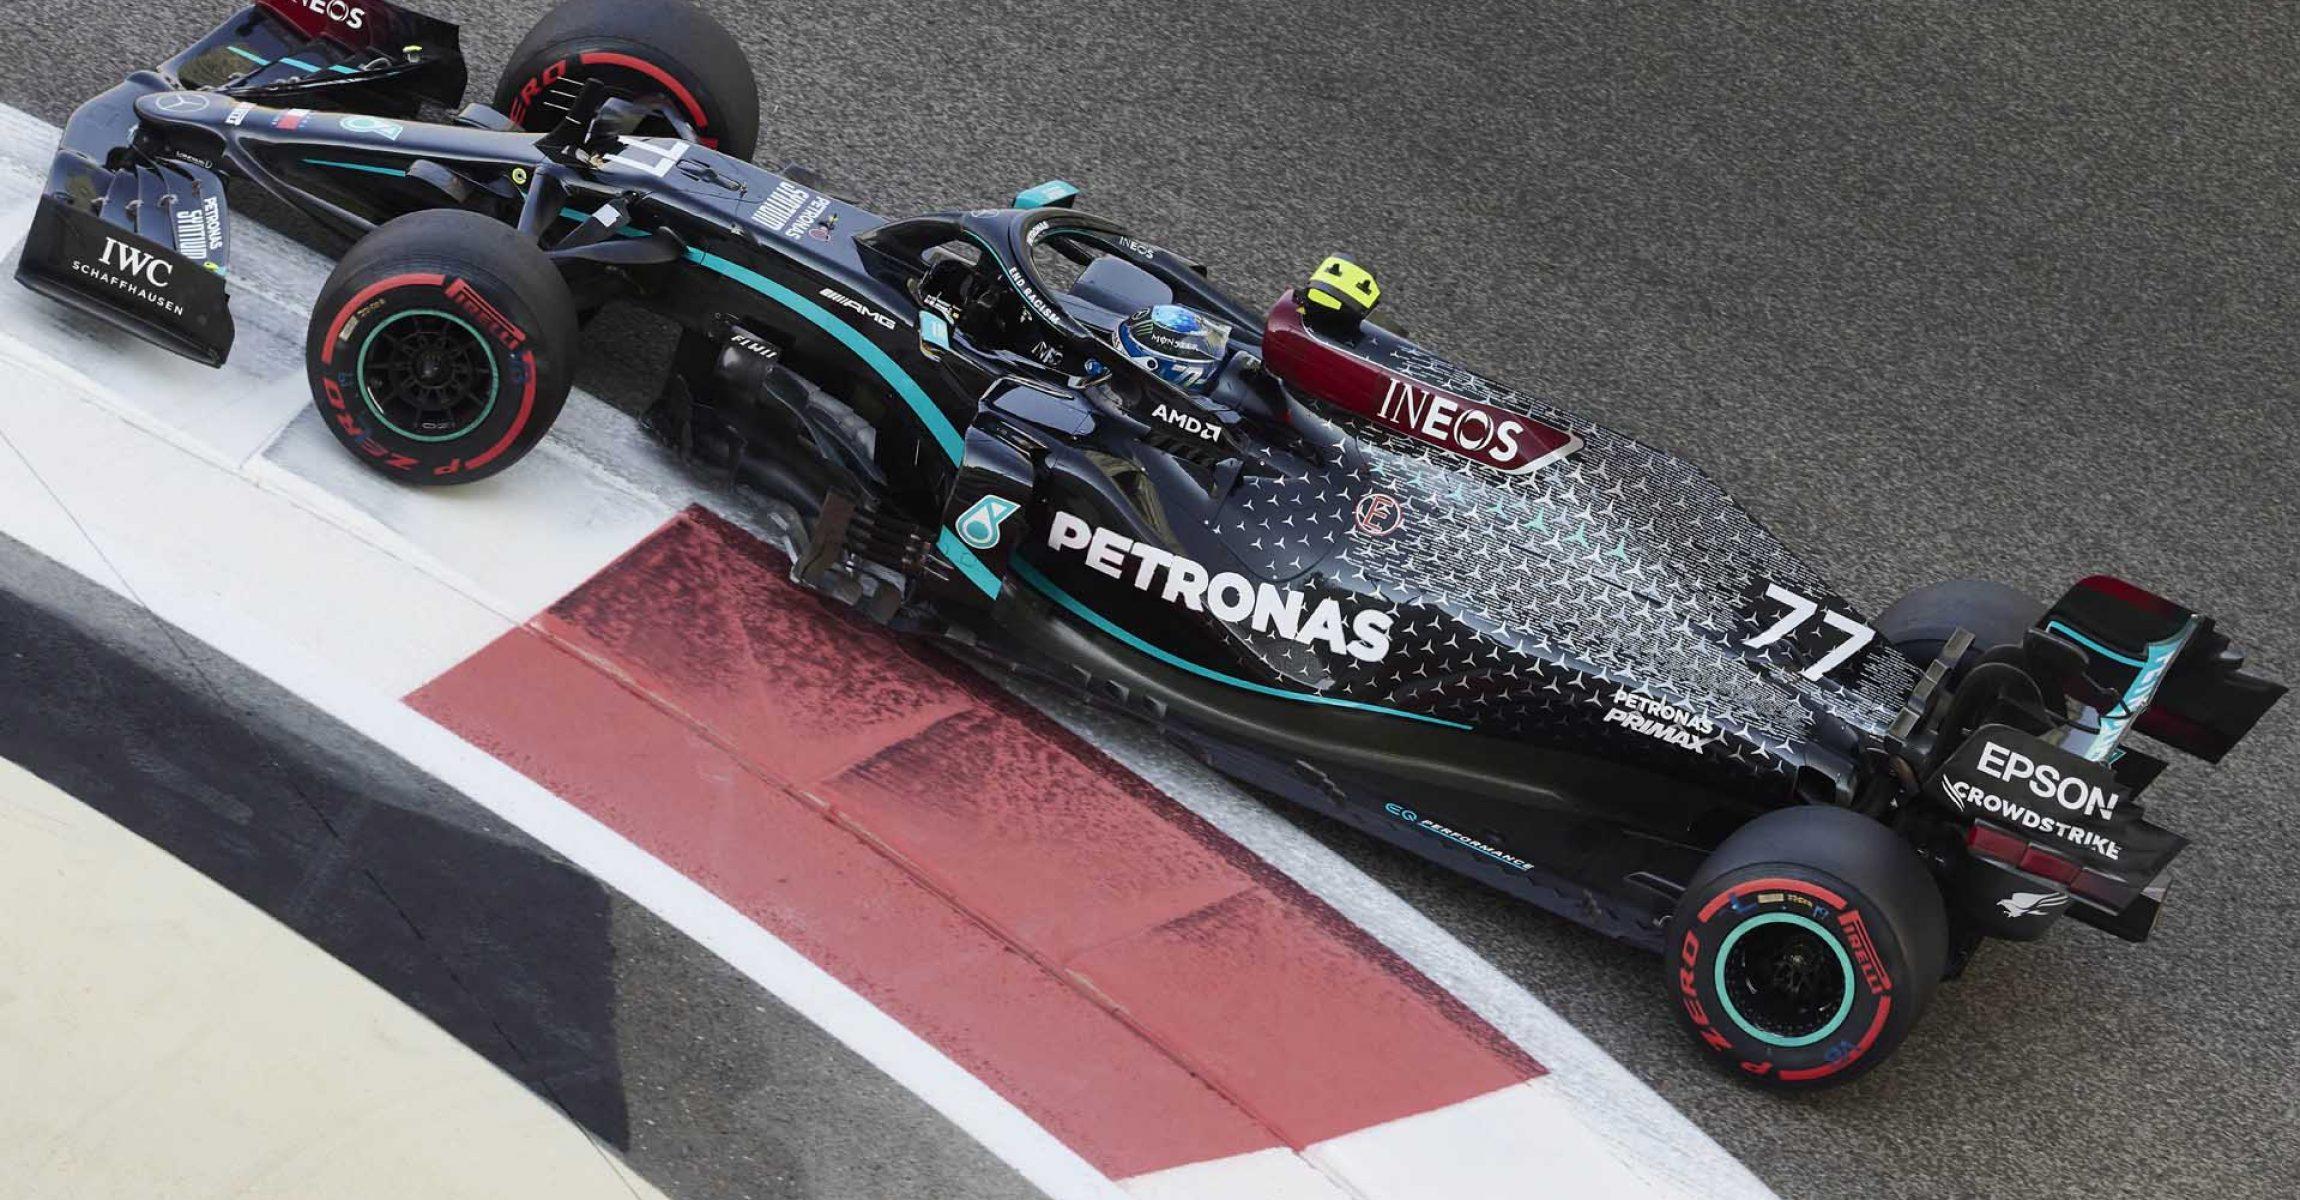 2020 Abu Dhabi Grand Prix, Saturday - Steve Etherington Valtteri Bottas Mercedes